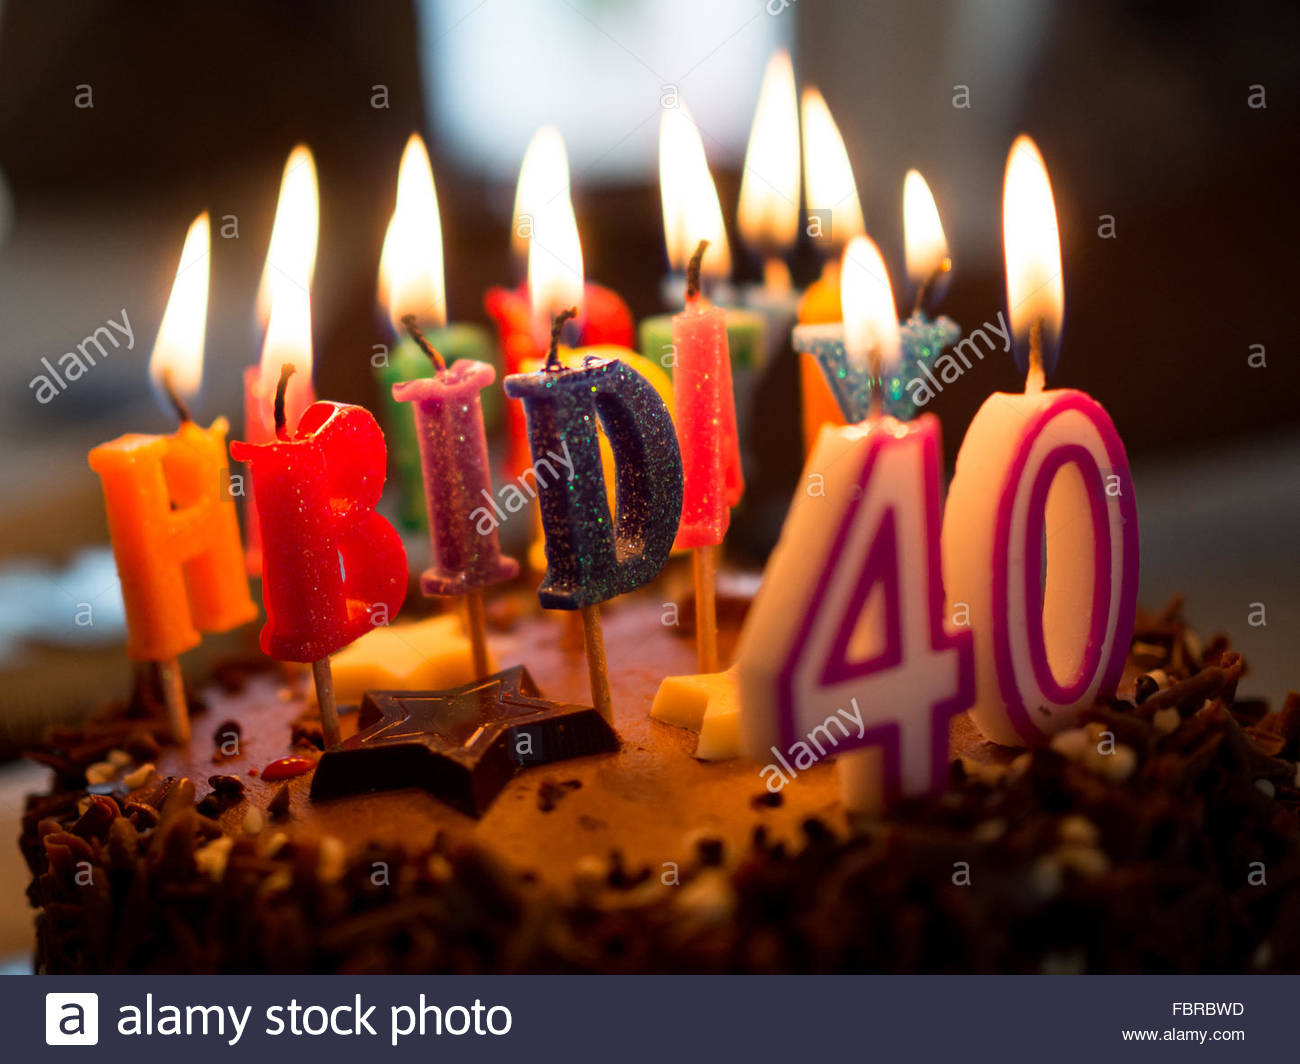 40th Birthday Cake Stock Photos 40th Birthday Cake Stock Images